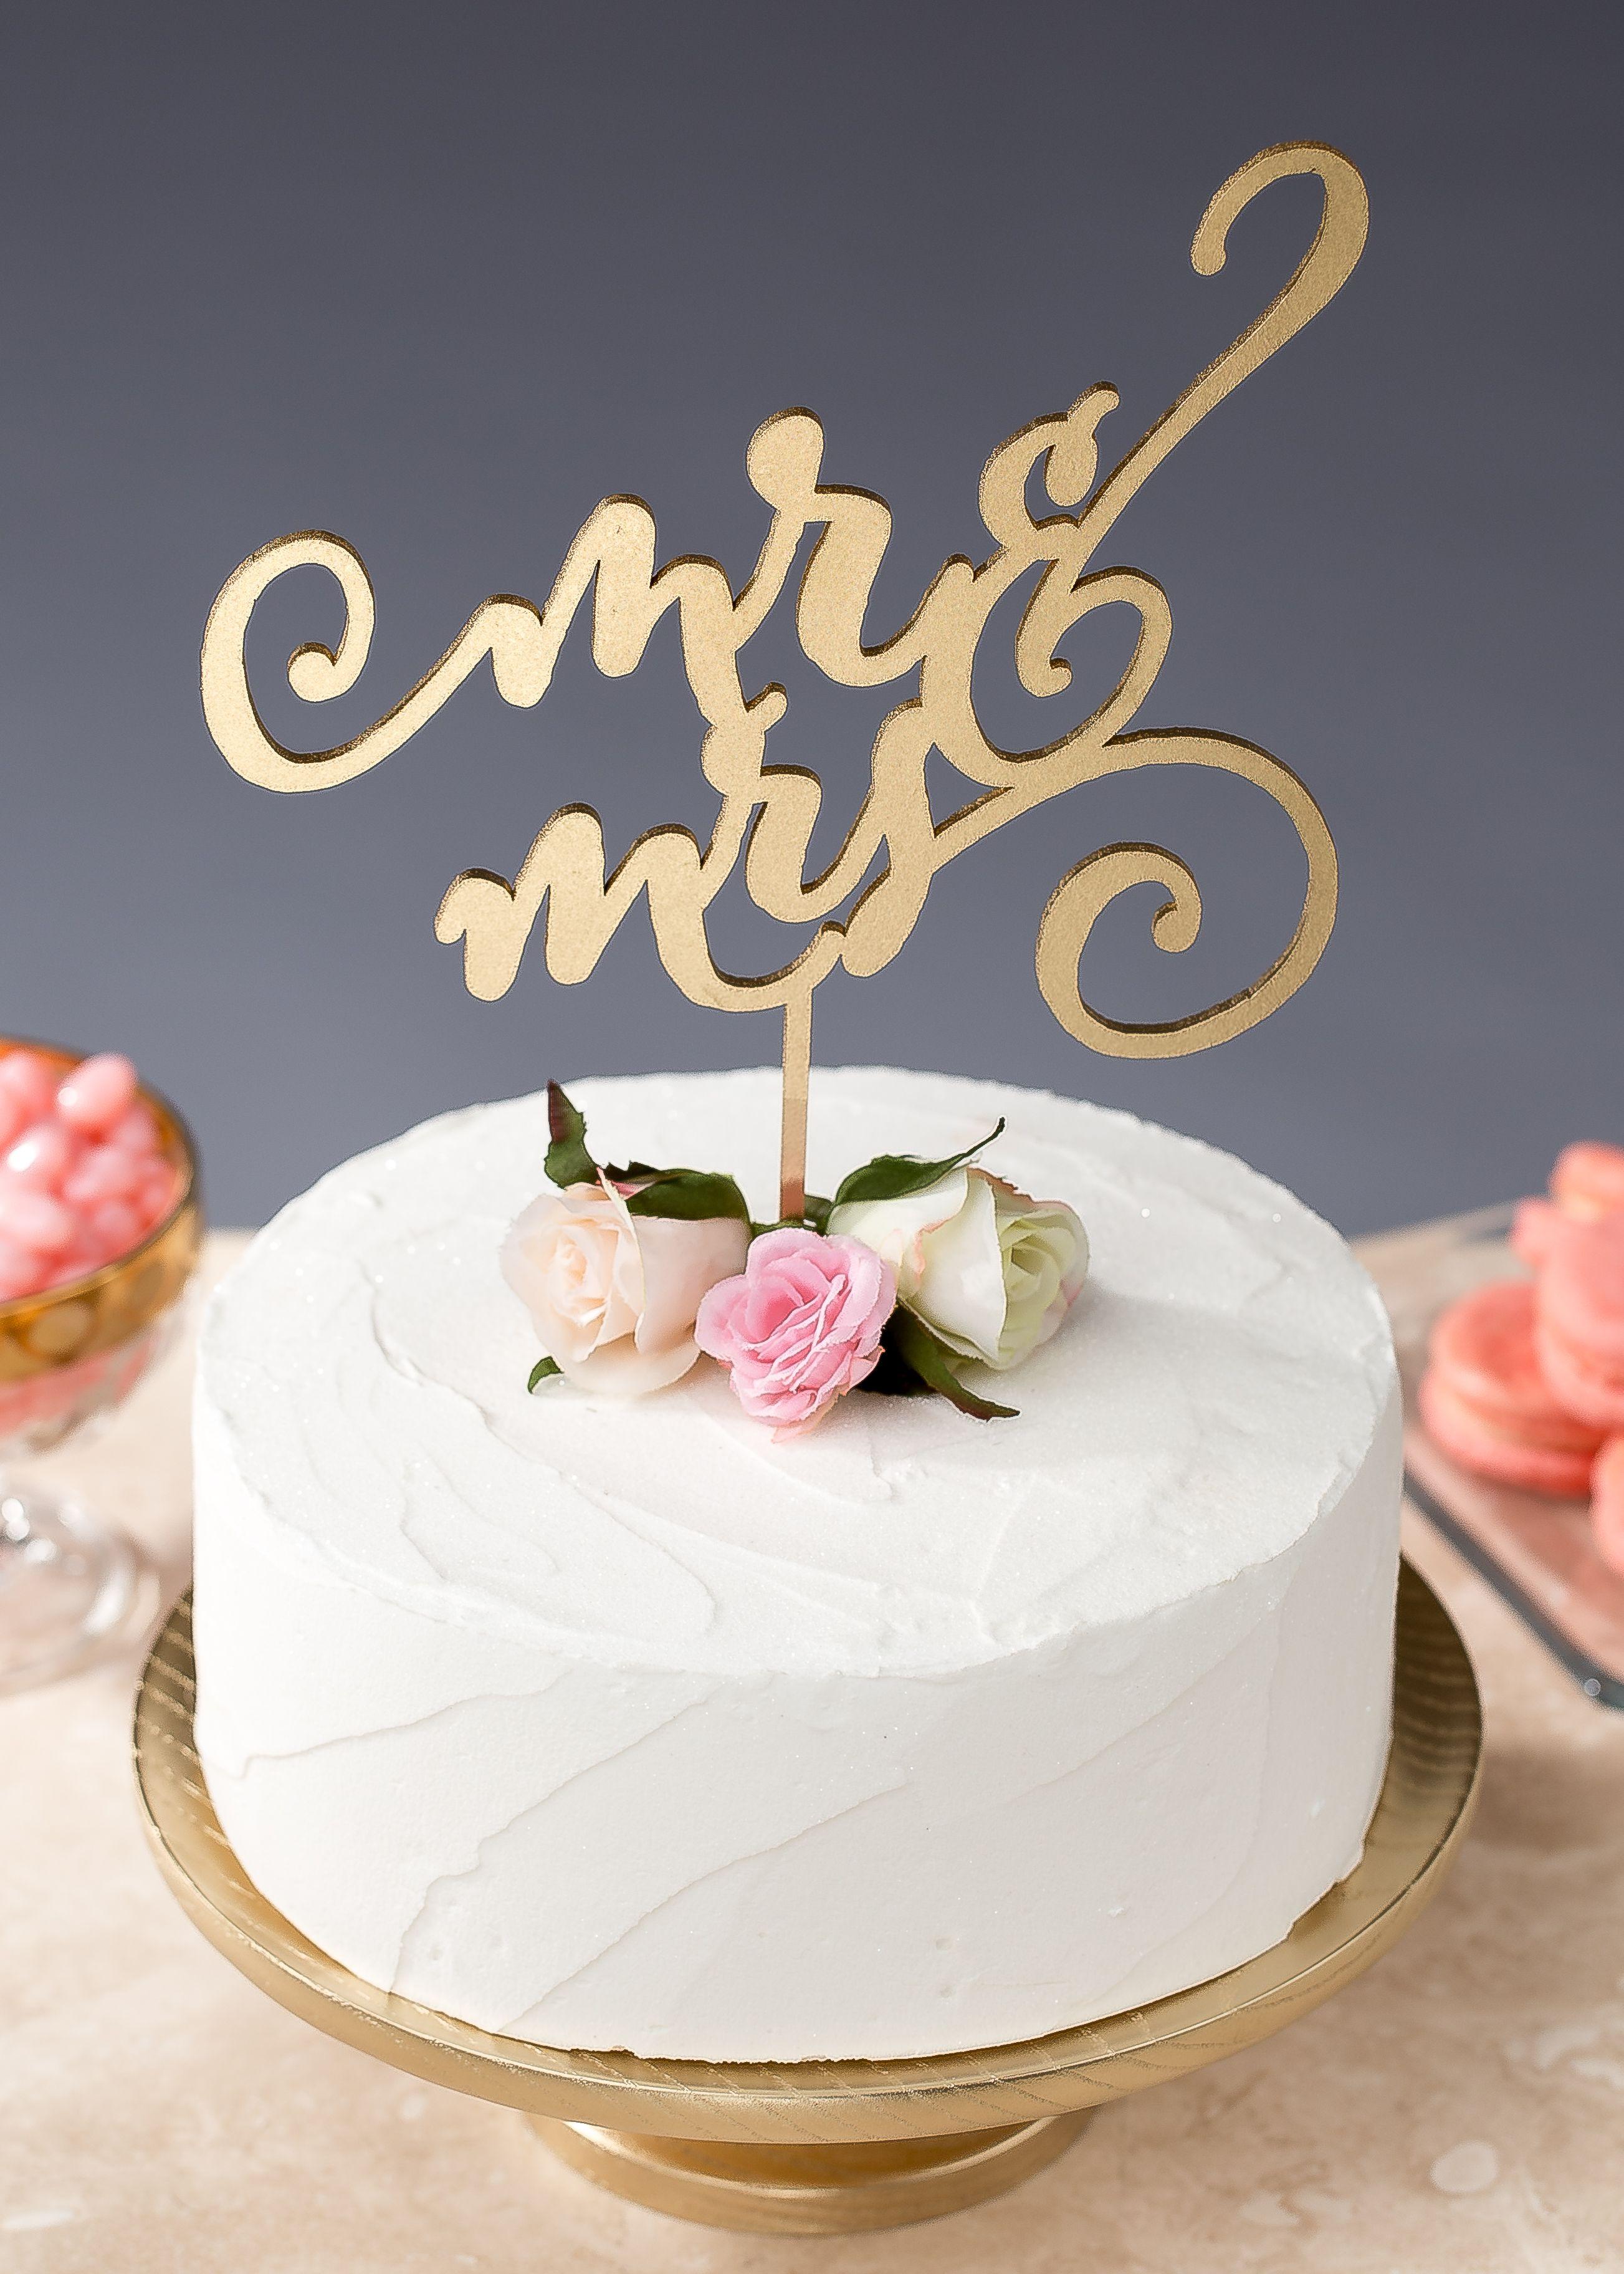 Mr And Mrs Wedding Cake Topper By Better Off Wed Www Betteroffwed Co Pasteles De Boda Sencillos Adornos De Torta Boda Ideas De Pastel De Boda